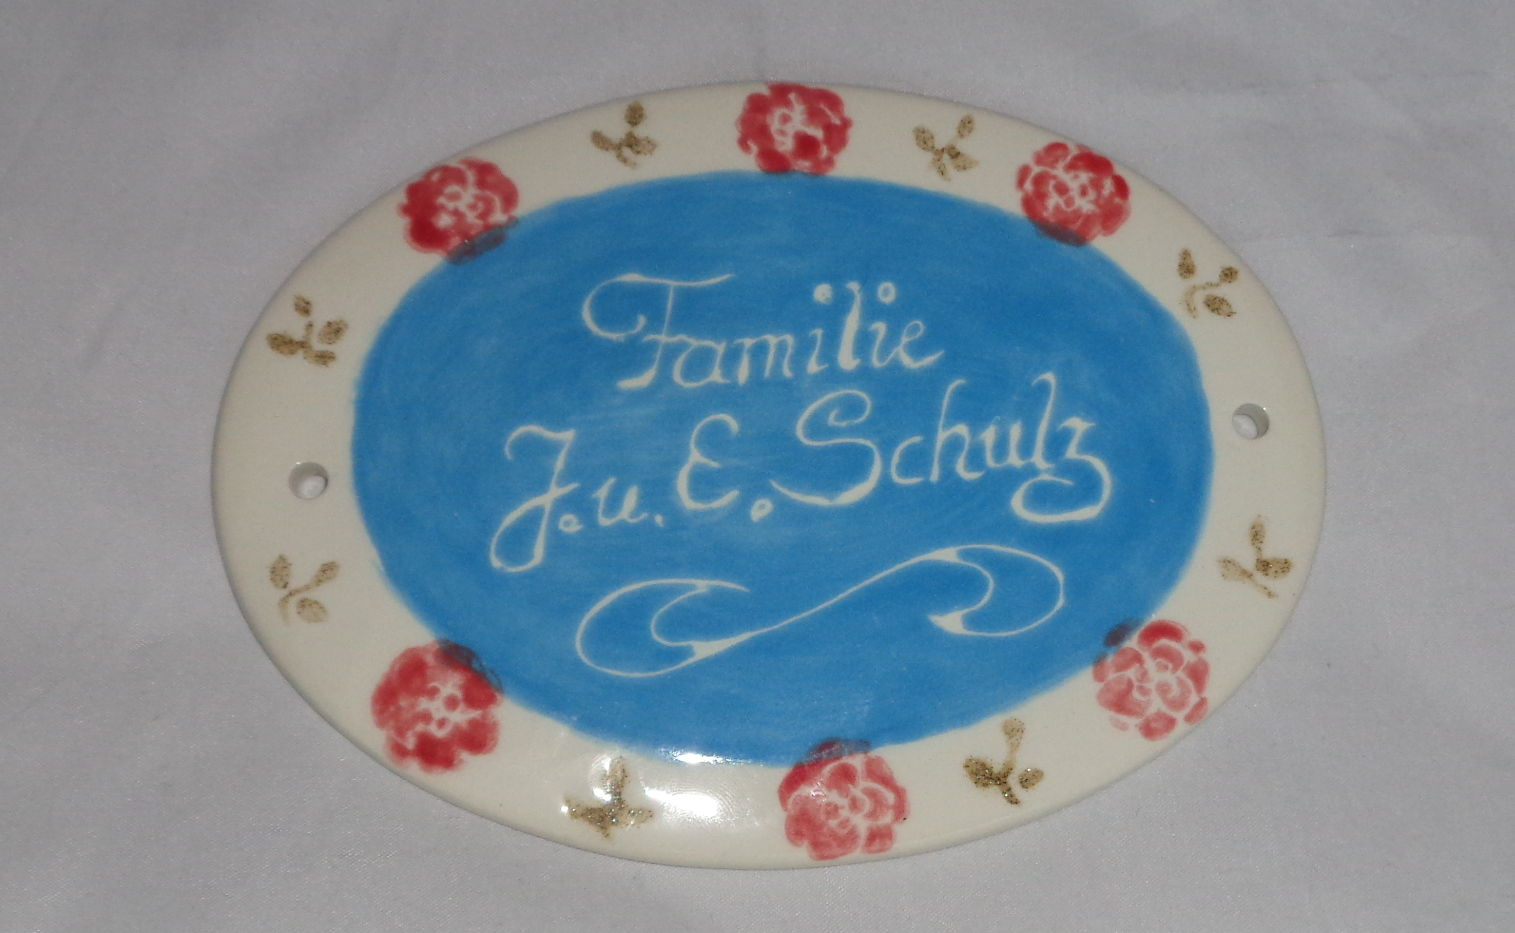 Bemalte Keramik Türschild Schulz